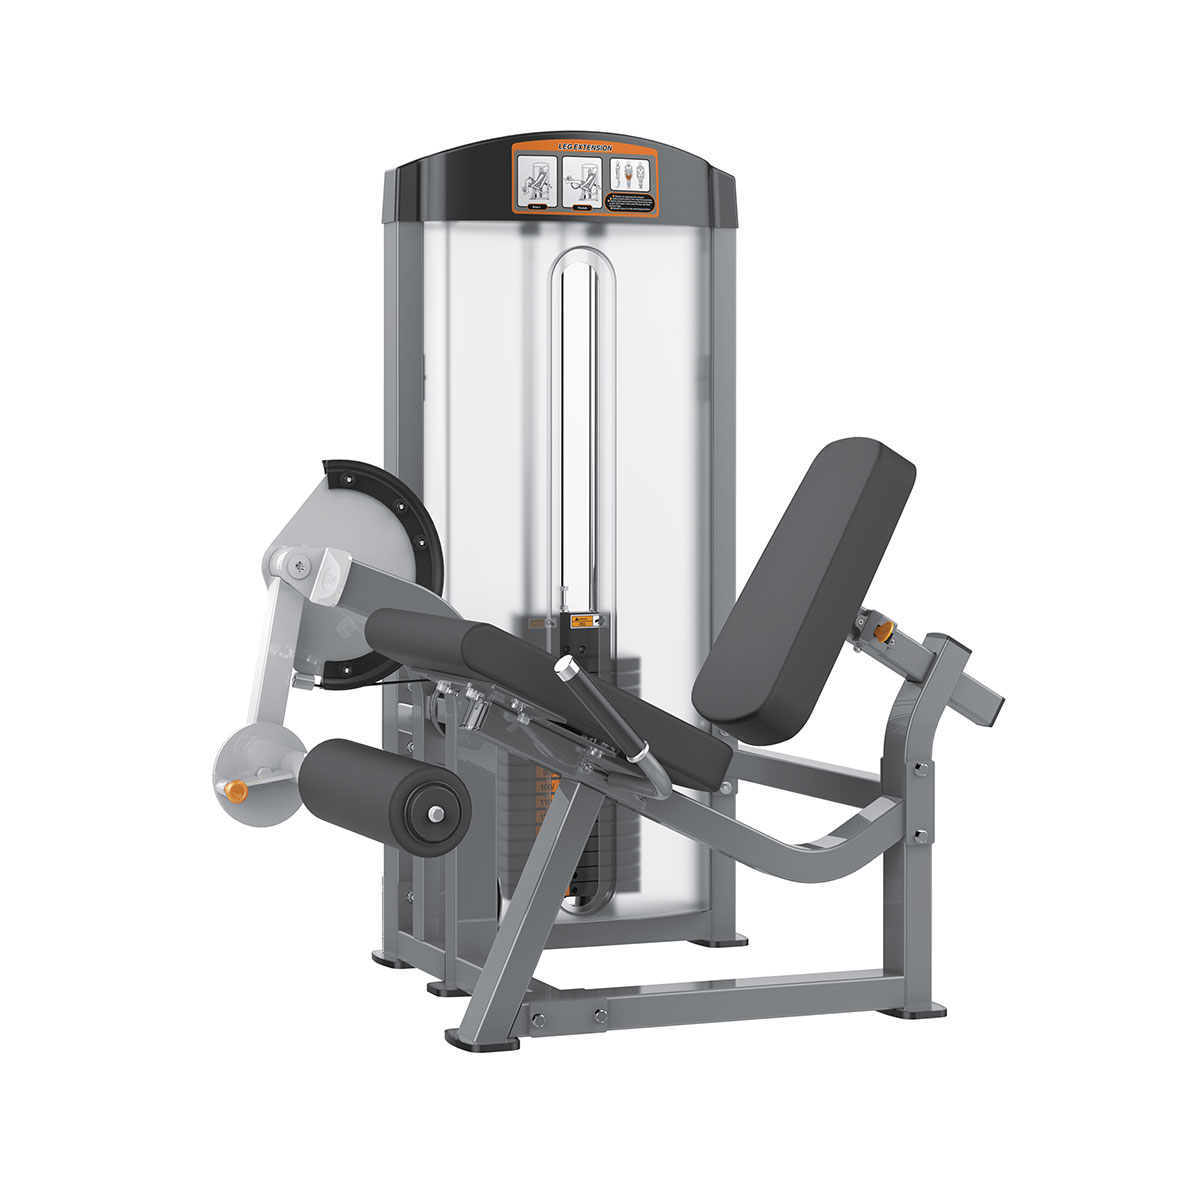 Leg Extension - 250 lbs